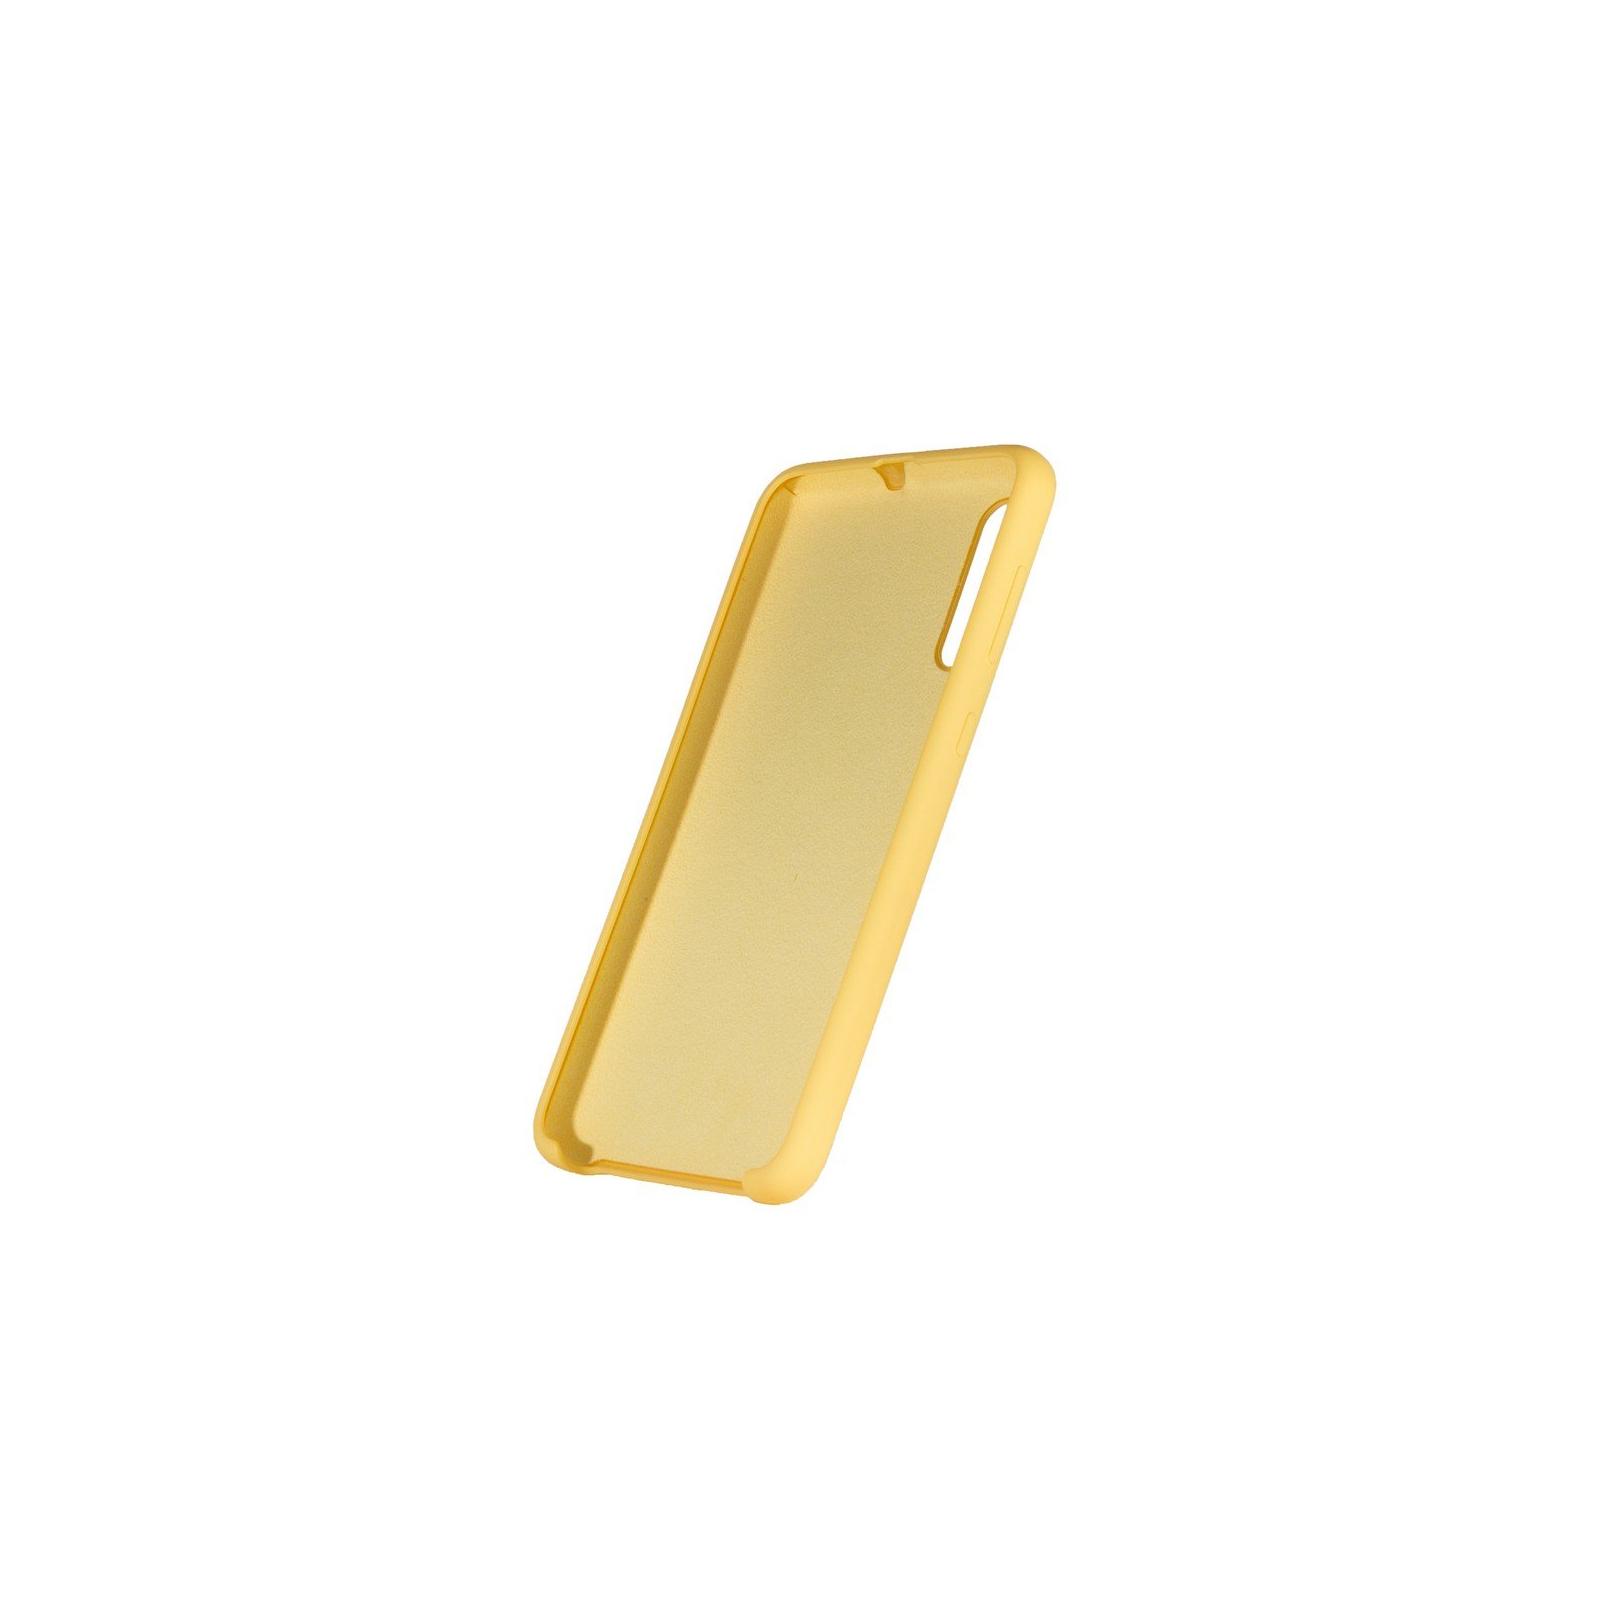 Чехол для моб. телефона ColorWay ColorWay Liquid Silicone для Samsung Galaxy A50 Yellow (CW-CLSSGA505-YL) изображение 4